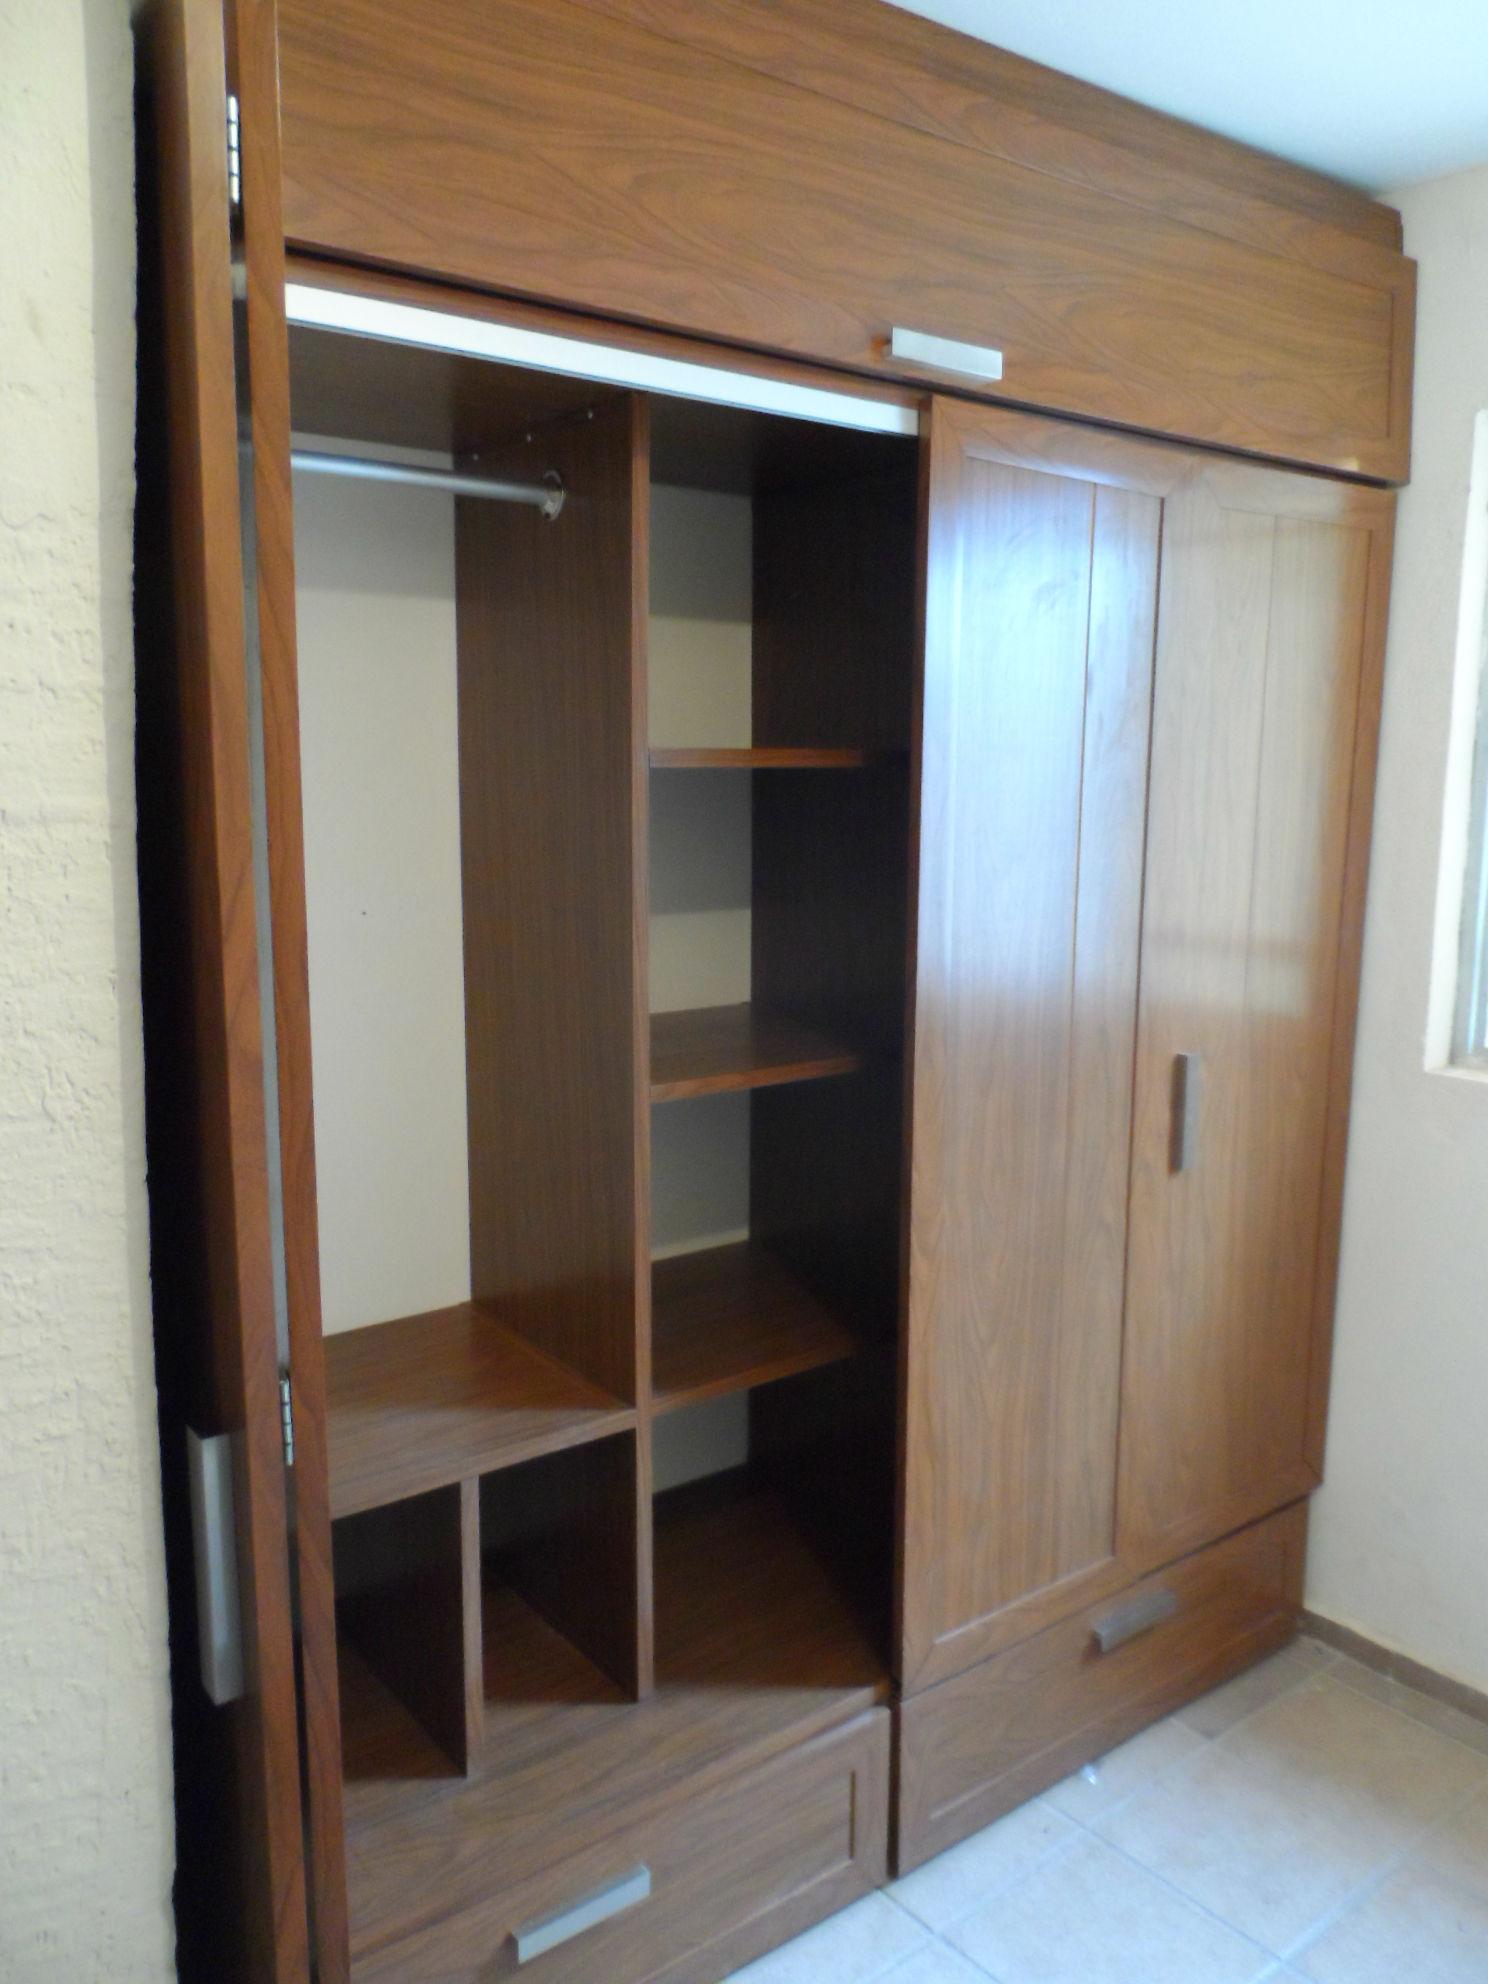 Closets de pvc con puertas plegables for Zapateras modernas para closet